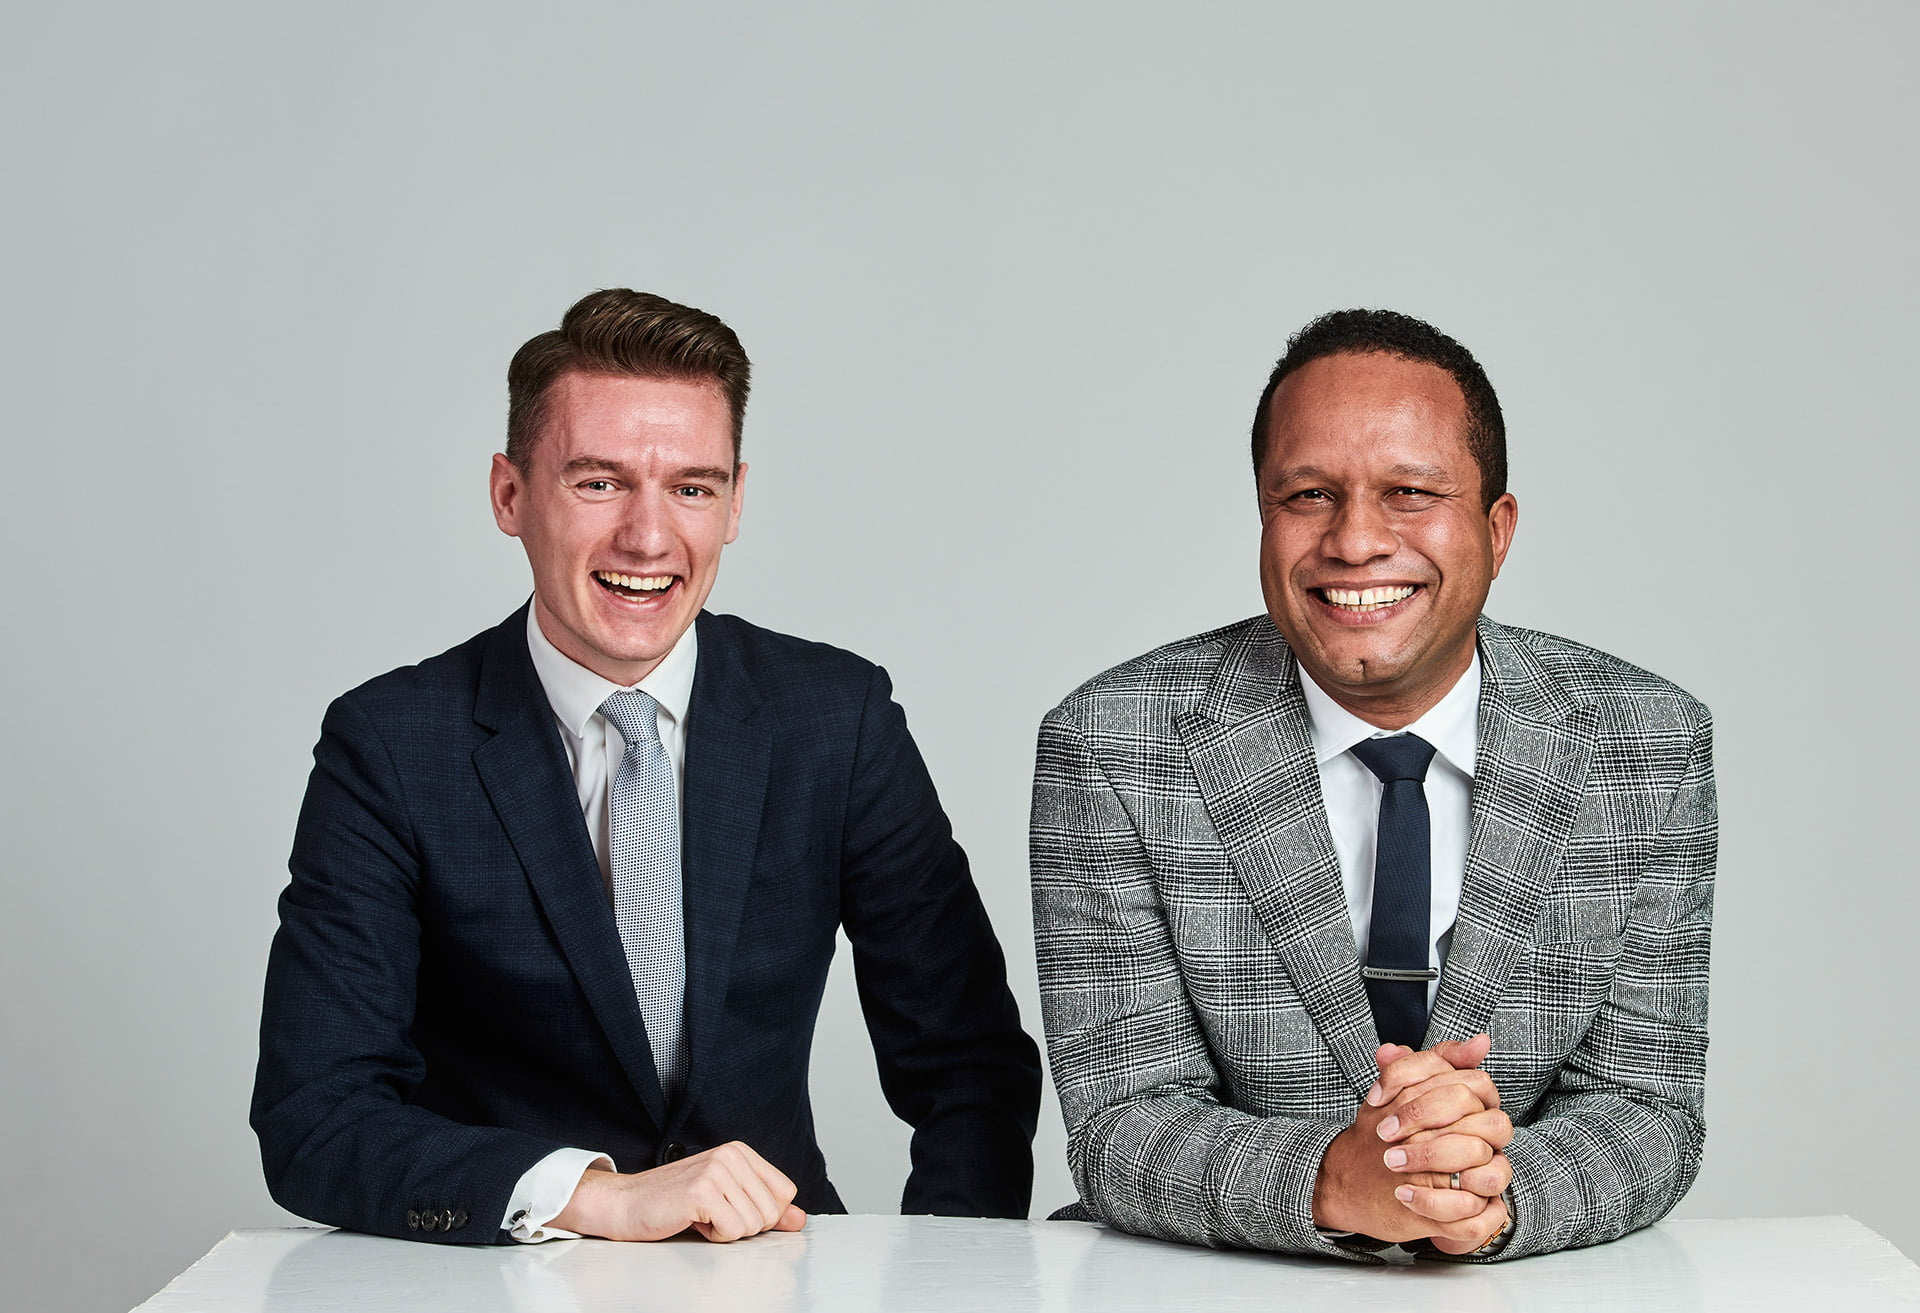 business_portraits_brighton